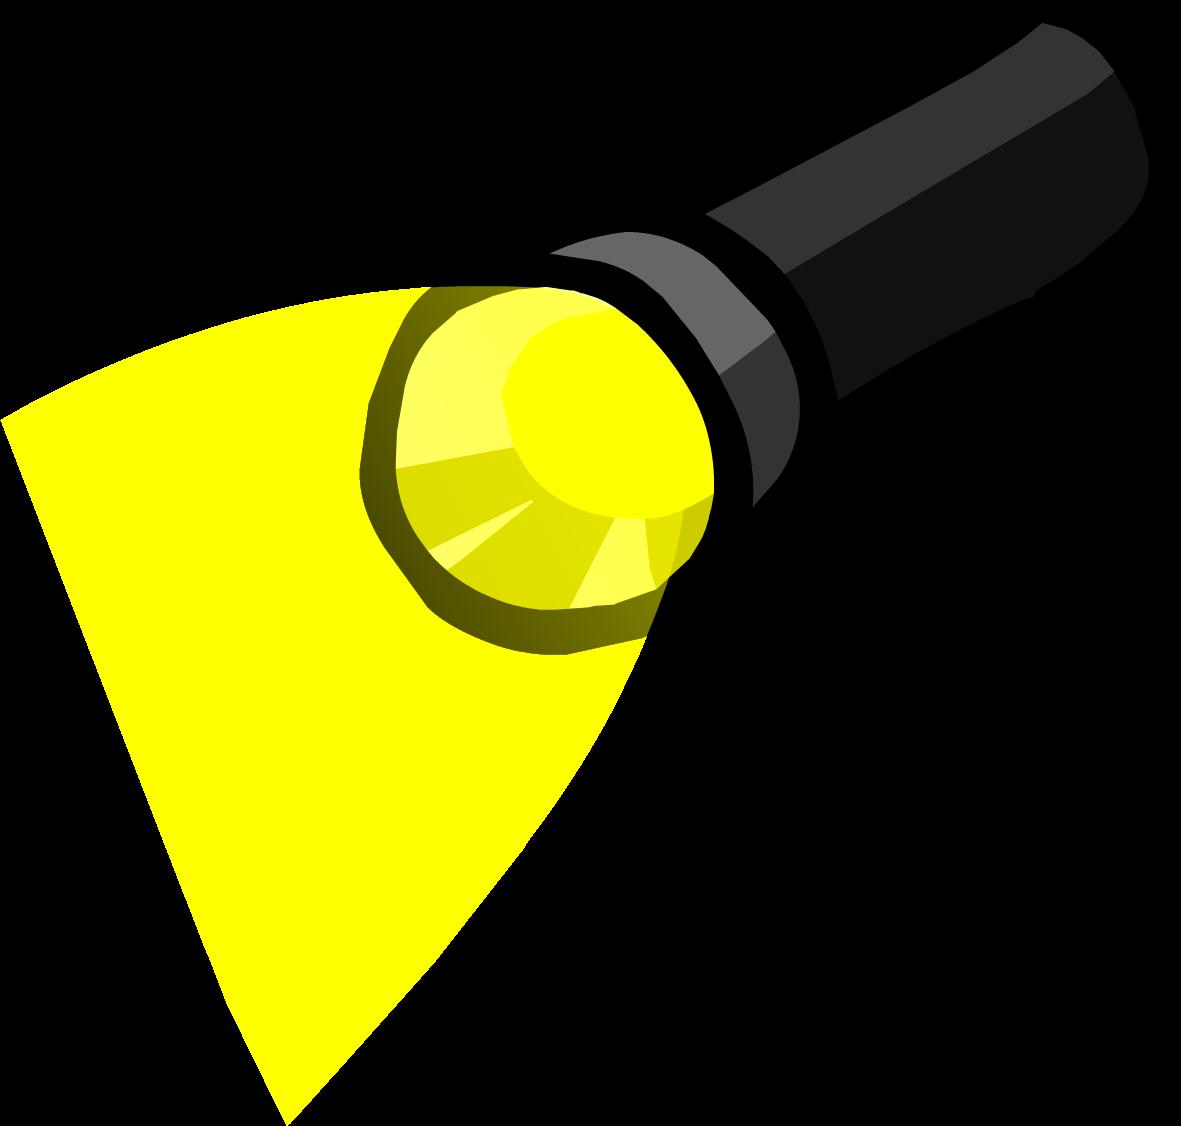 Hand clipart lantern. Flashlight club penguin wiki